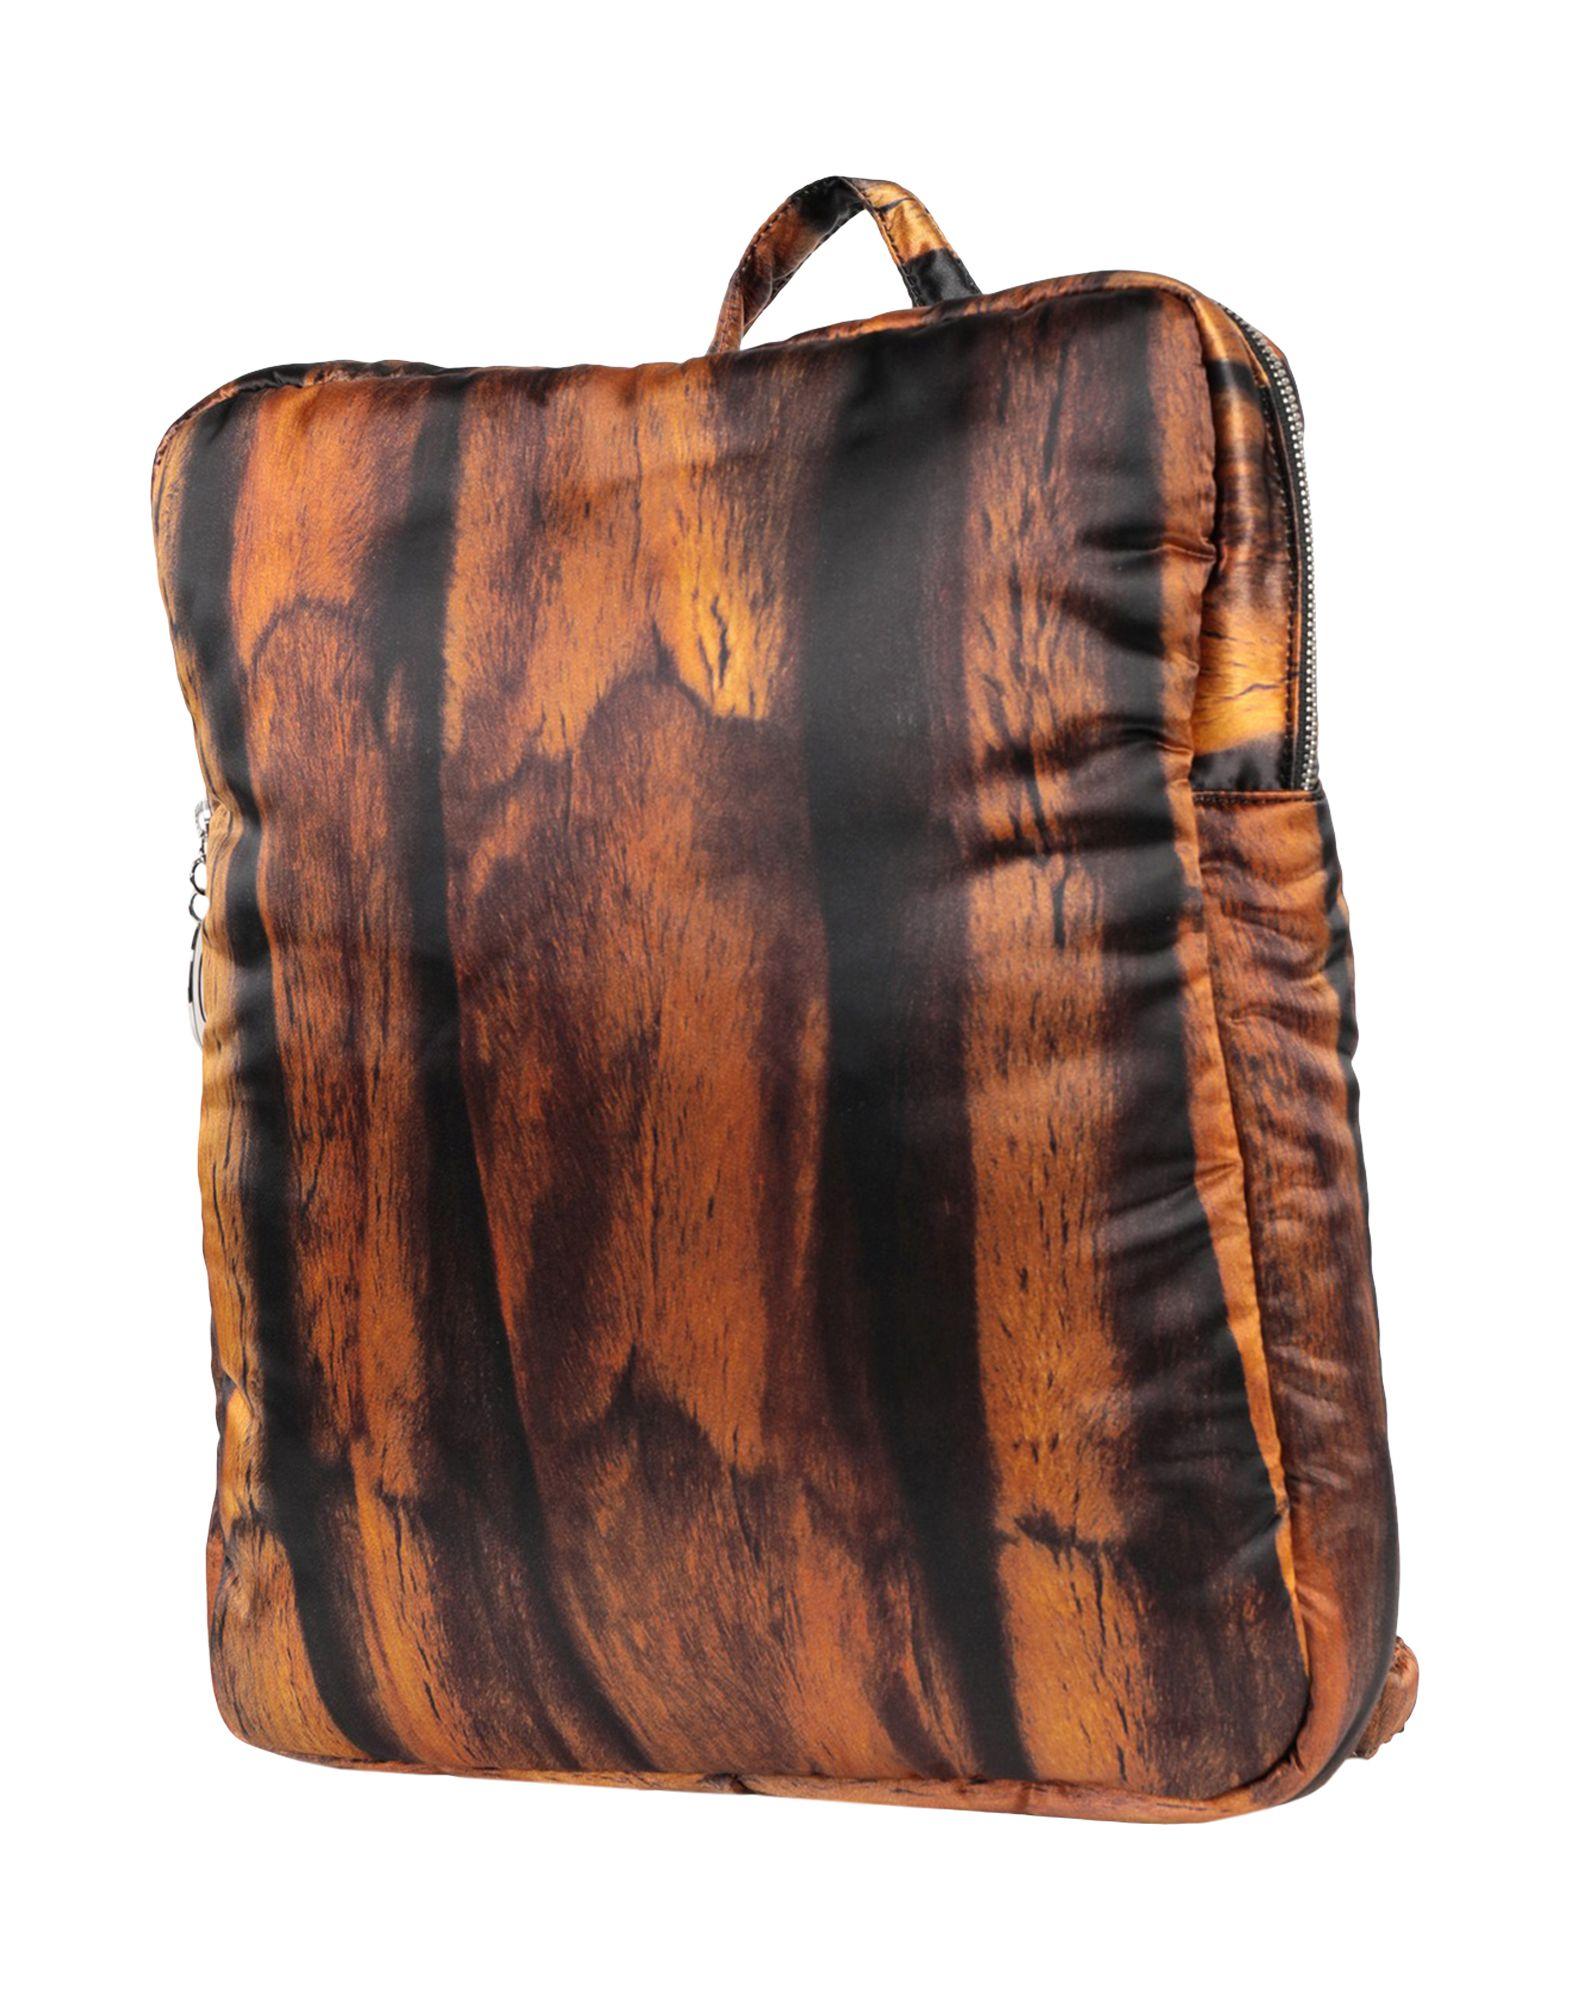 mm6 maison margiela деловые сумки MM6 MAISON MARGIELA Деловые сумки